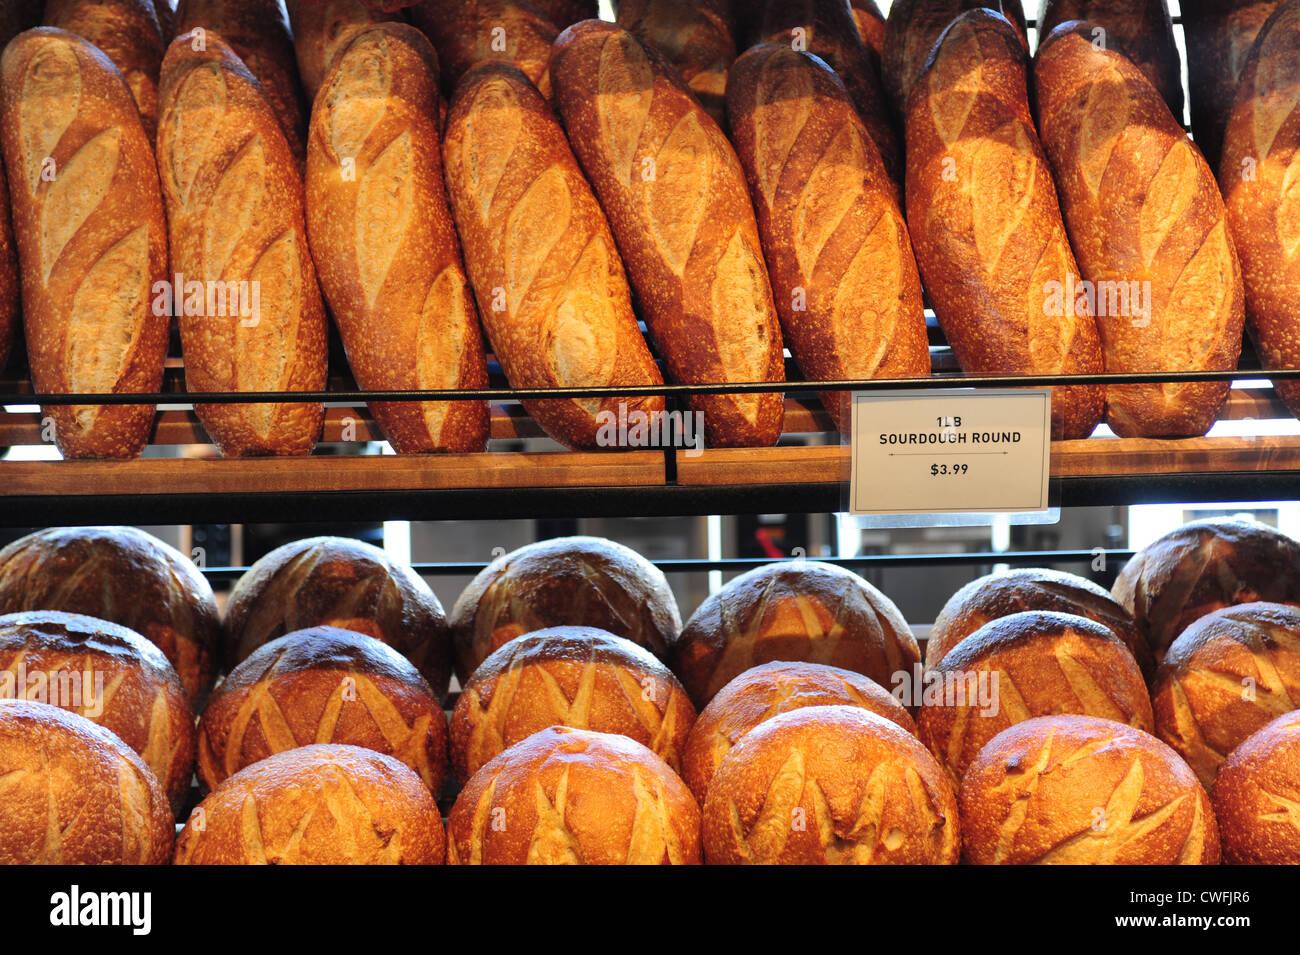 usa-california-ca-san-francisco-boudin-bakery-at-fishermans-wharf-CWFJR6.jpg